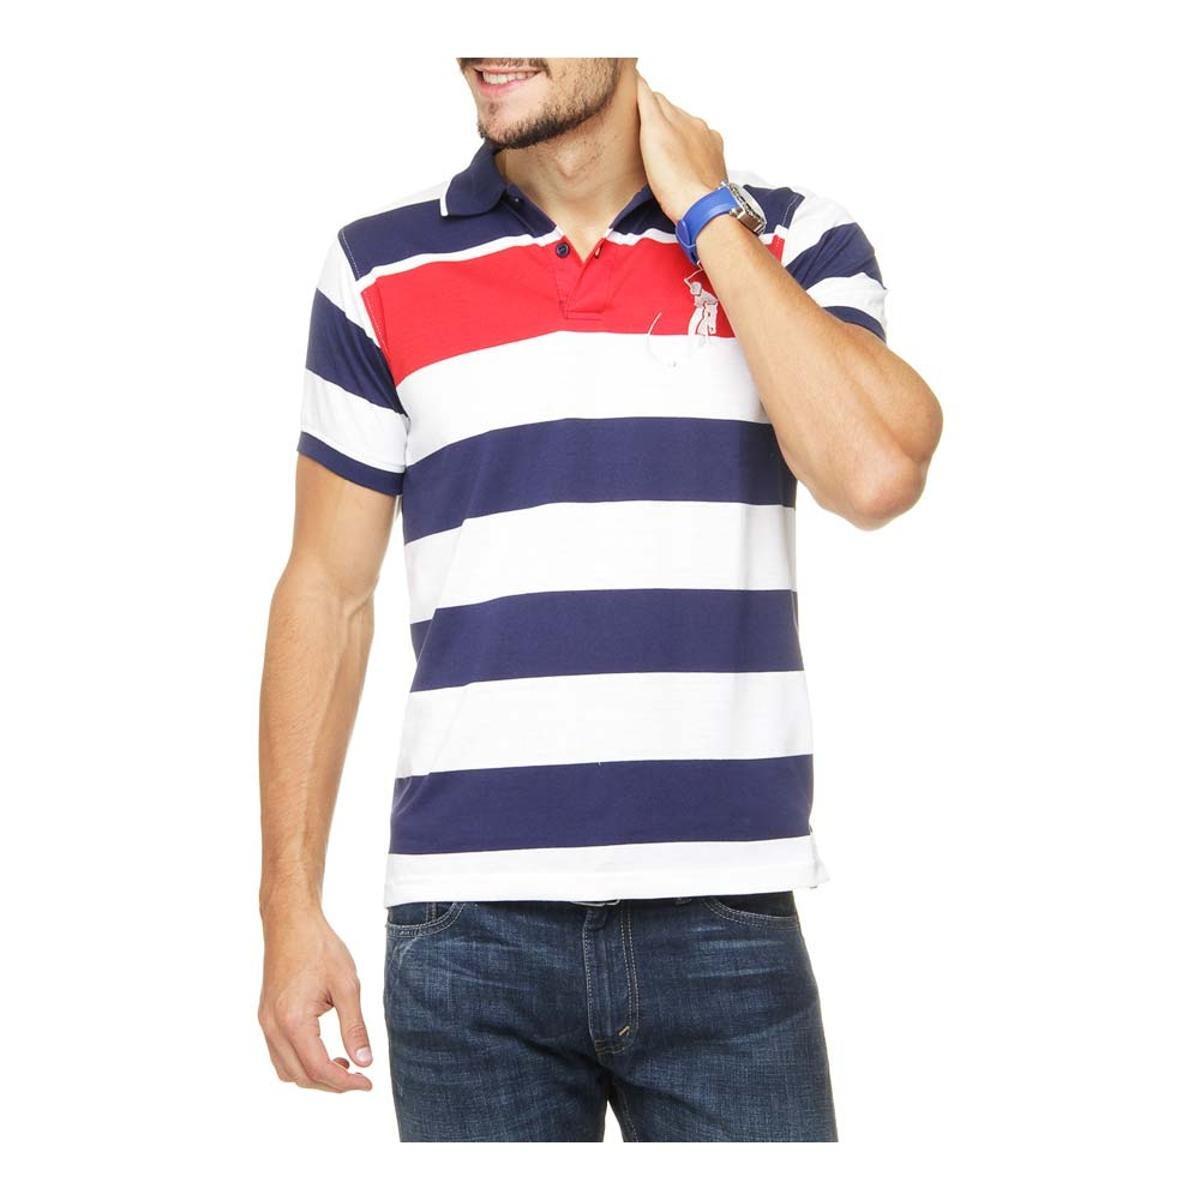 Camisa Polo Long Beach Polo Club Mc Listrada Cvl Gd Bordado - Compre Agora   c9d1428b64b